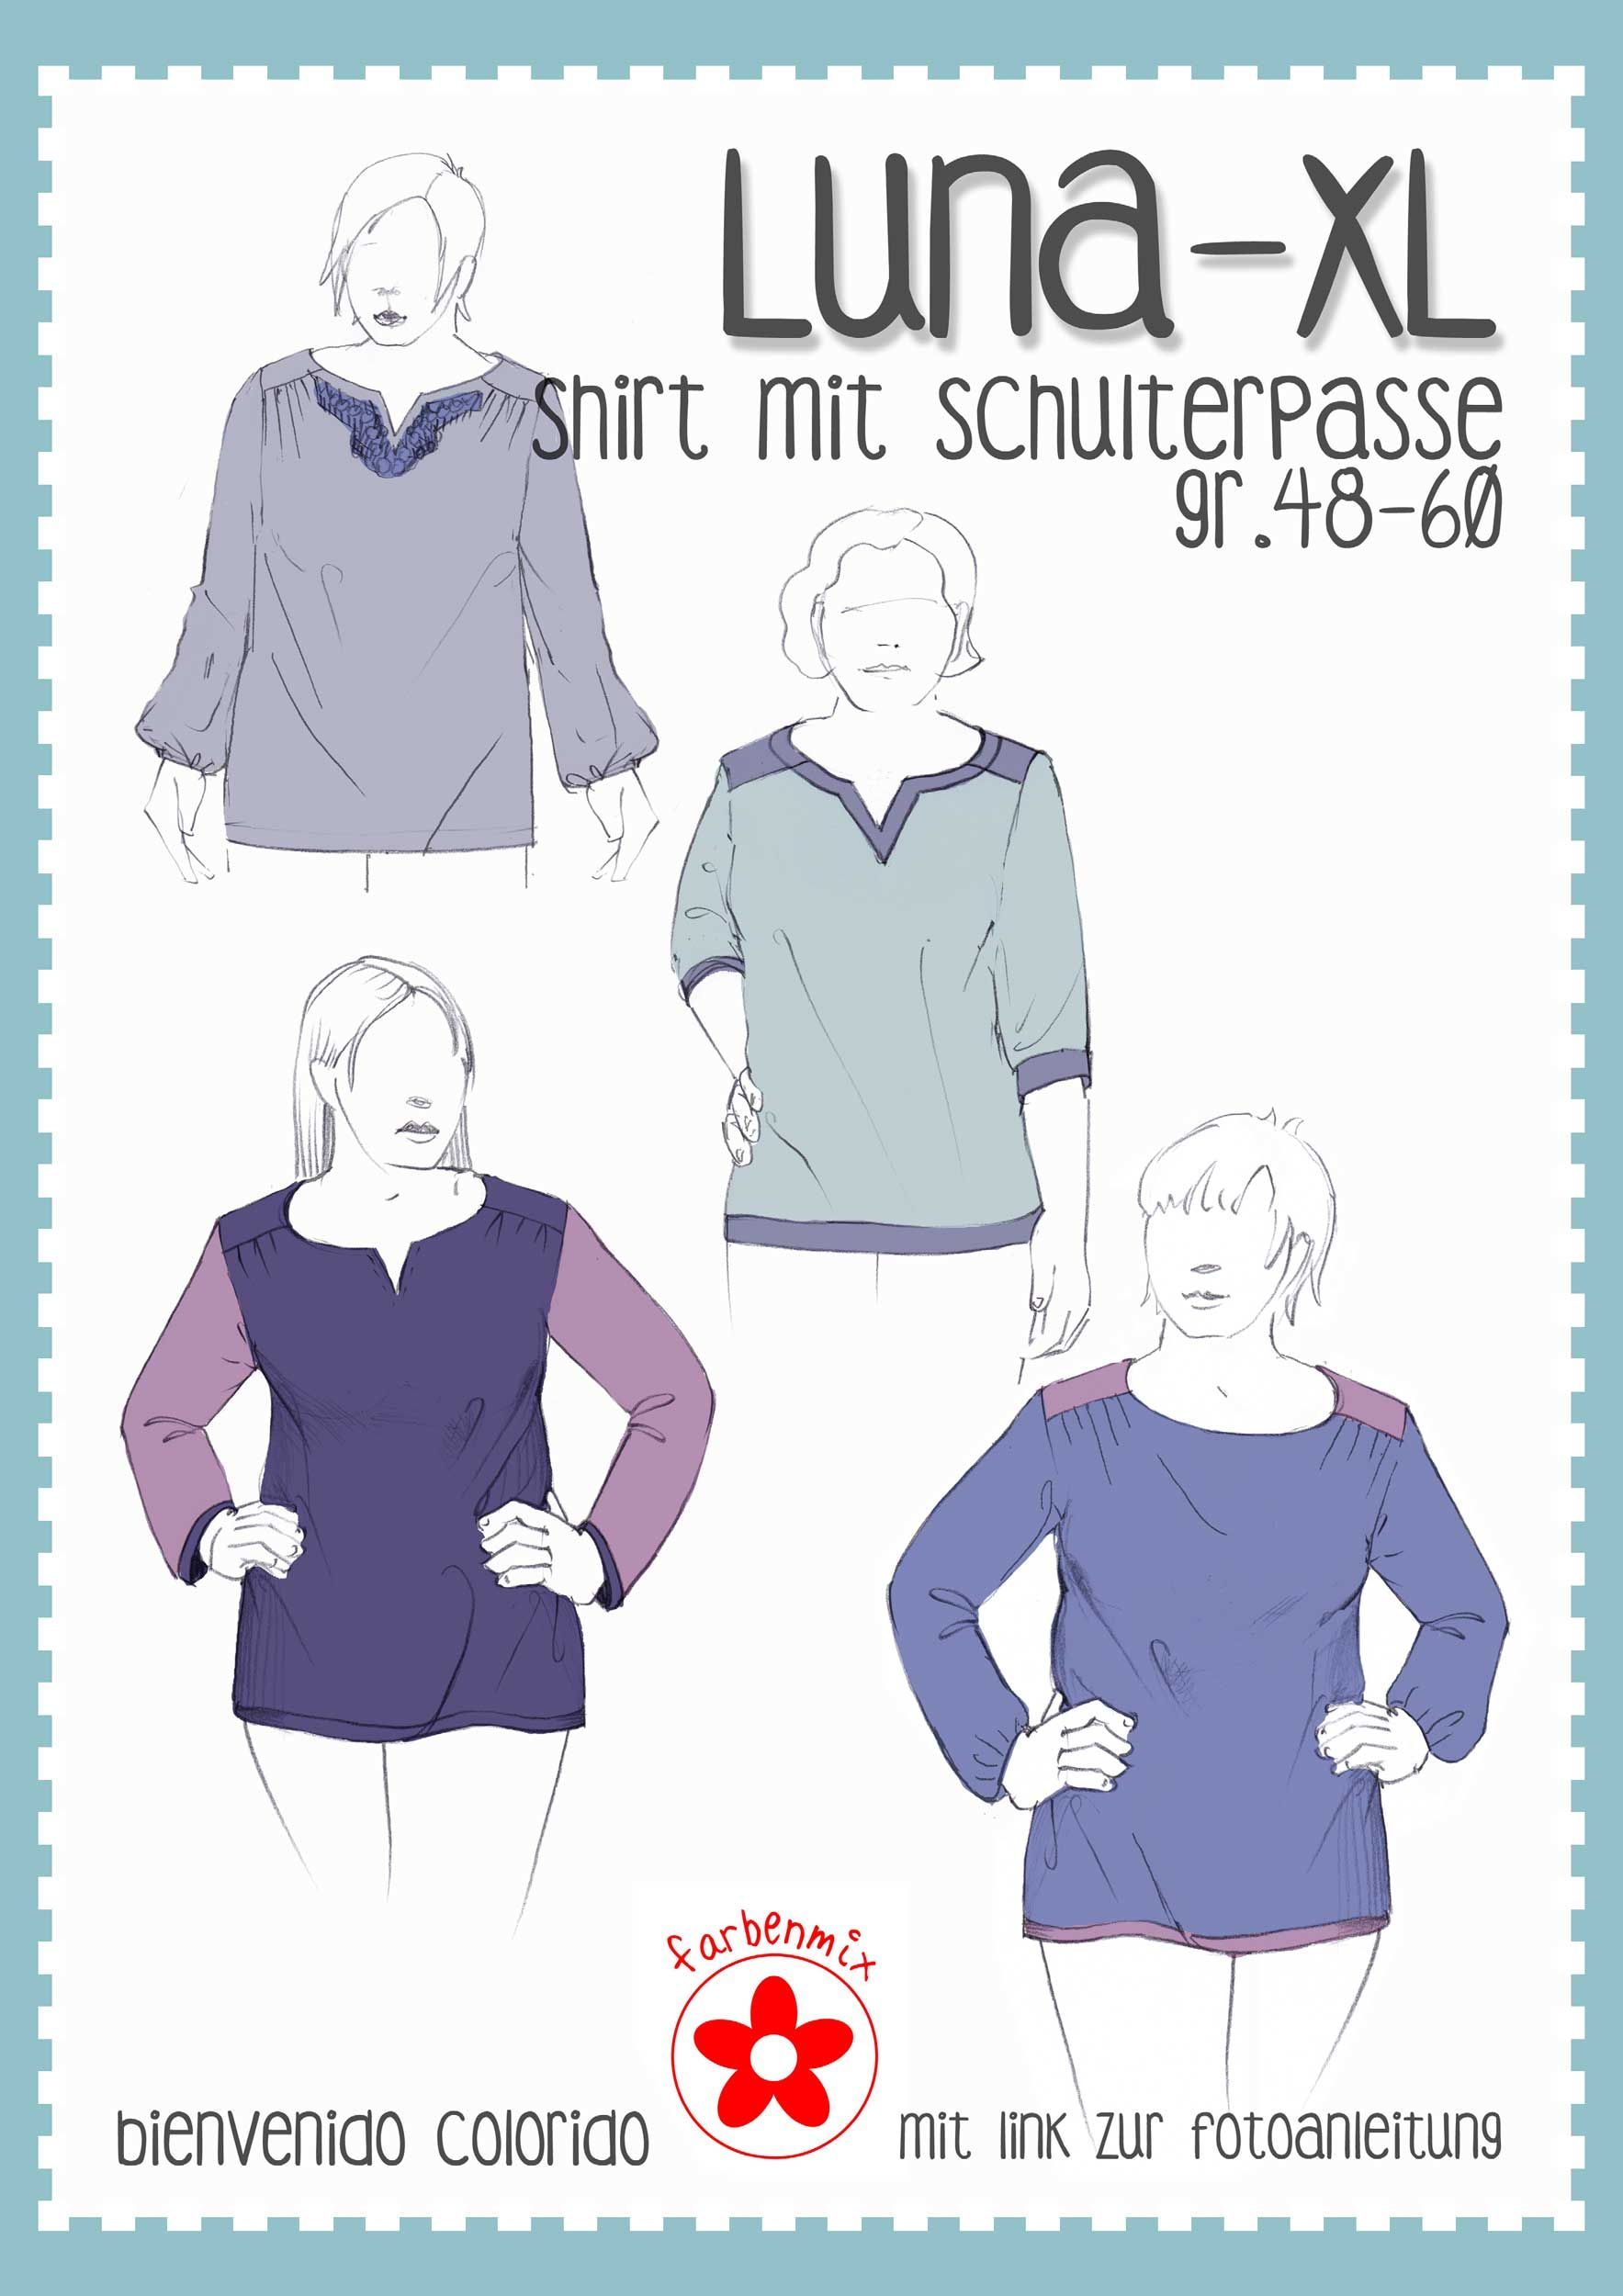 Photo of Luna XL, ladies fit shirt, pattern